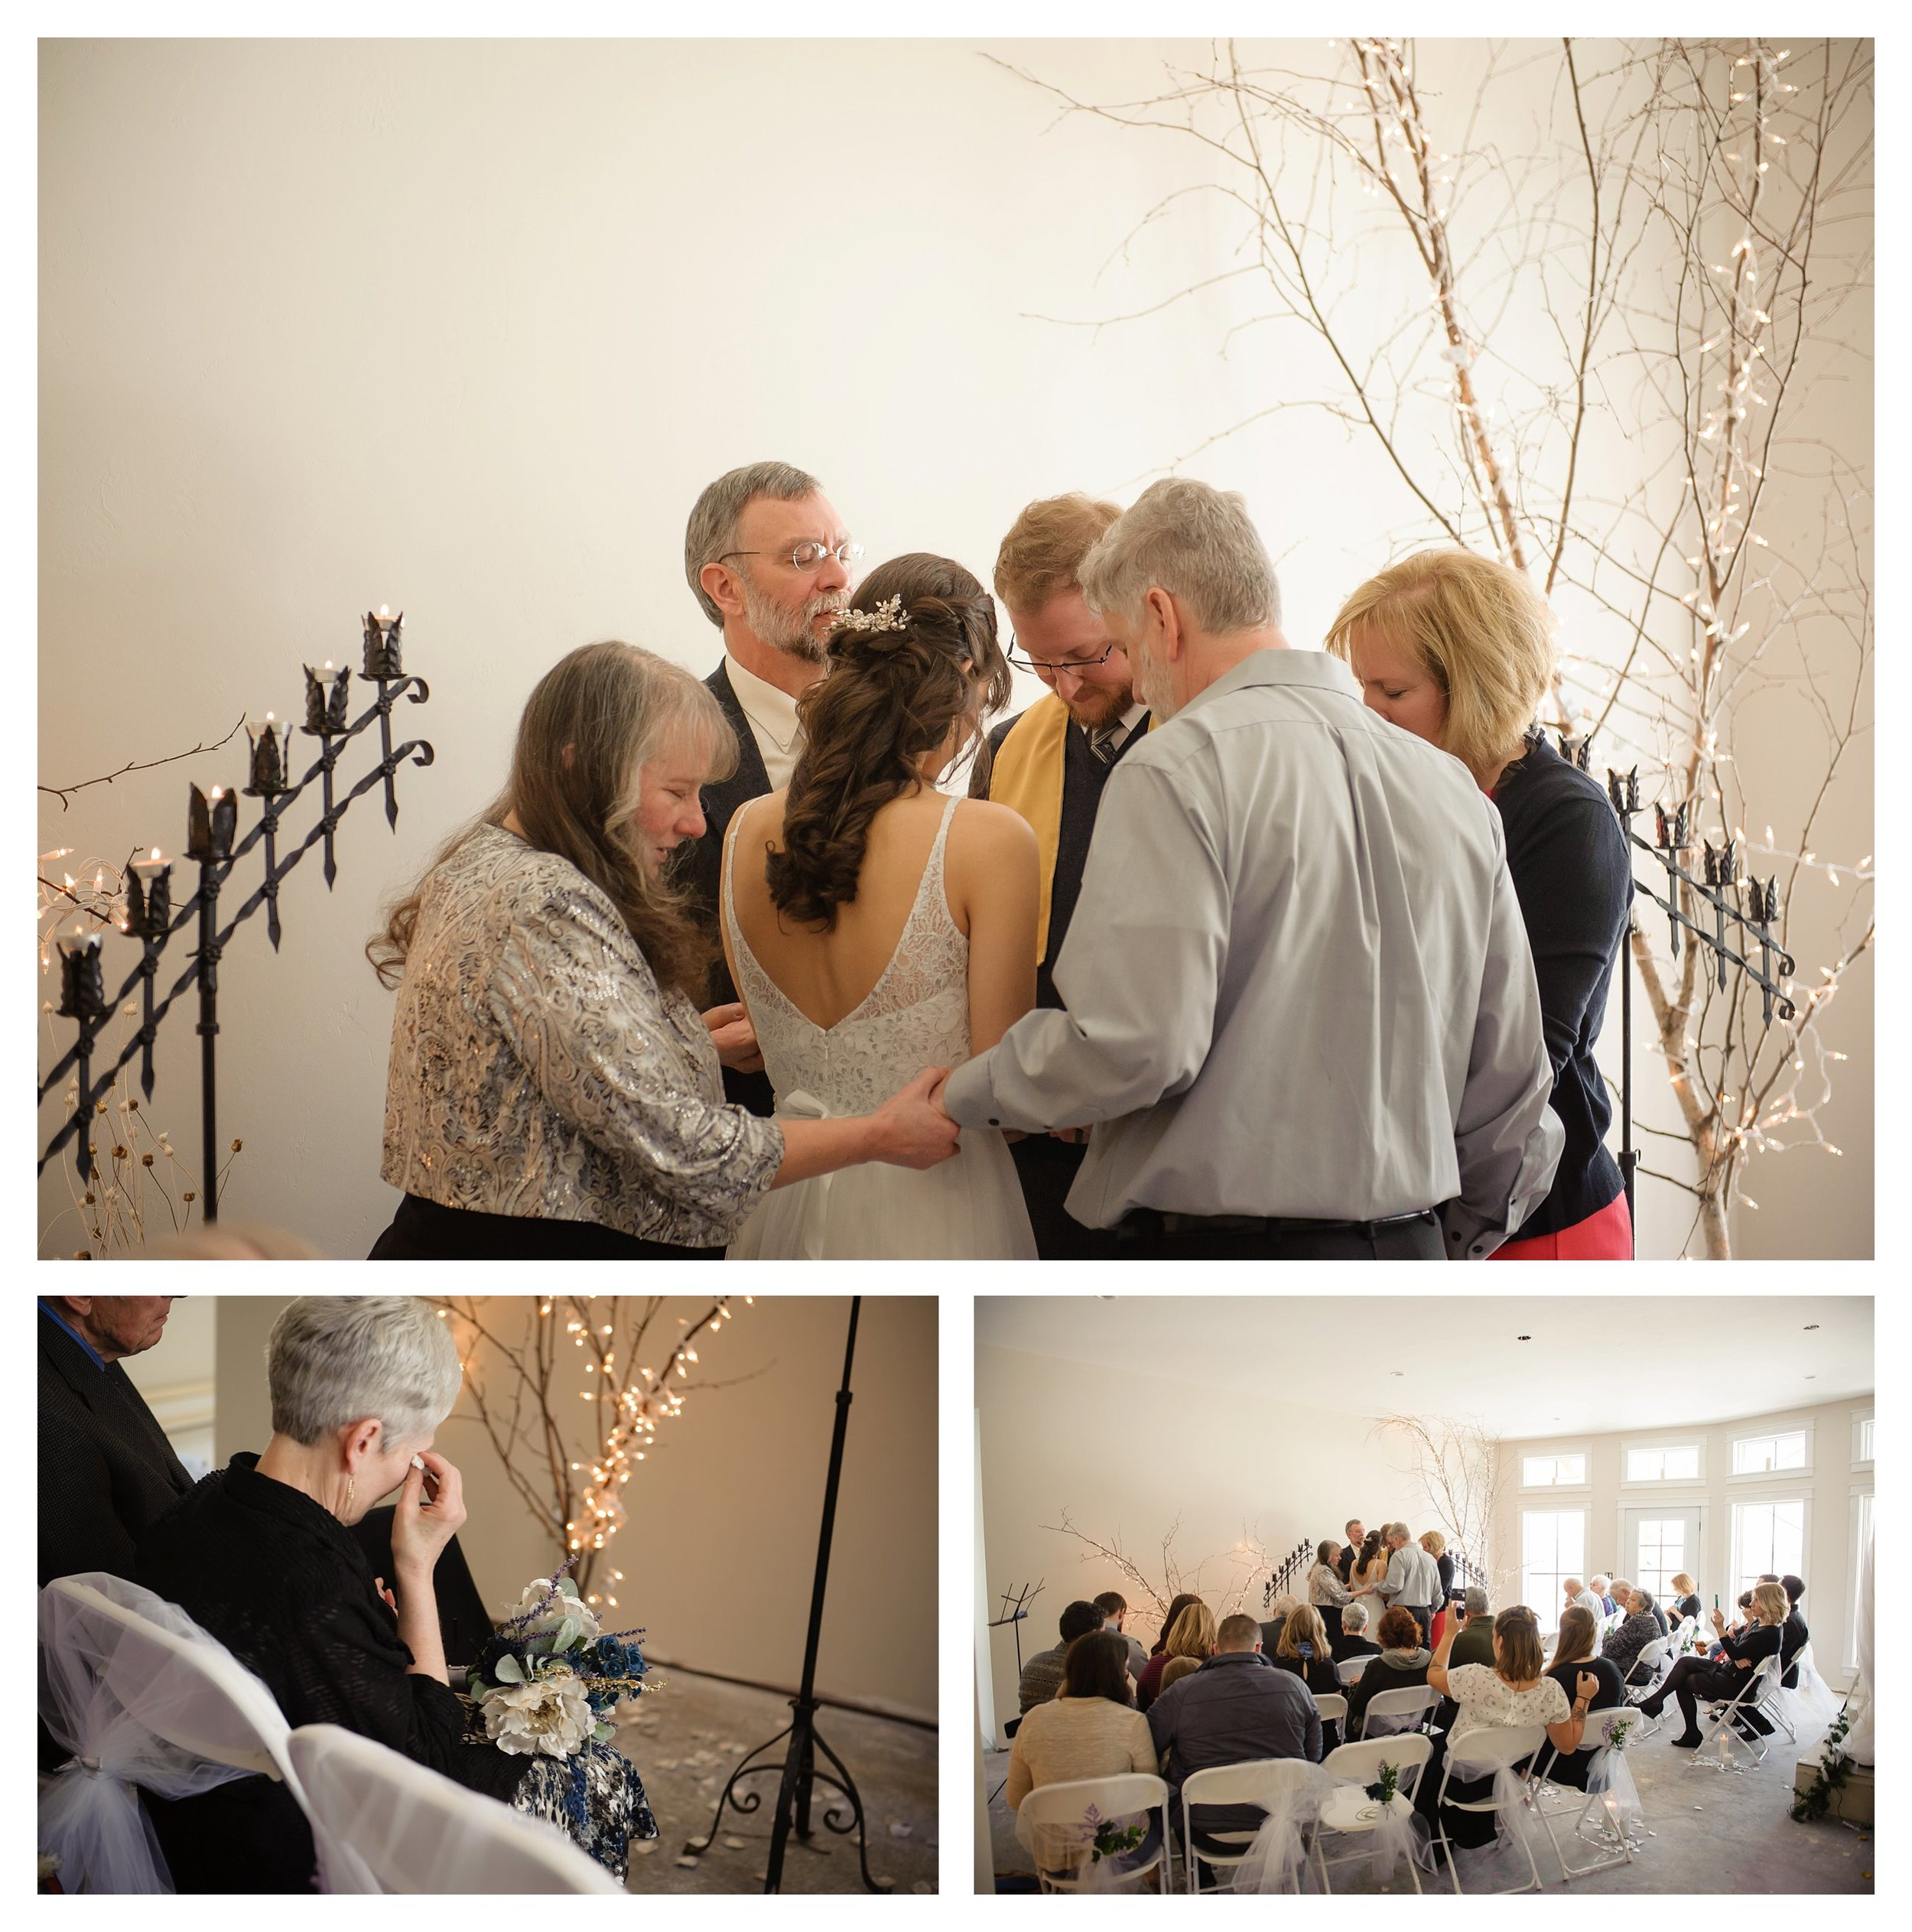 wisconsin wedding photographer timber baron inn bayfield wi ps 139 photography jen jensen_0207.jpg